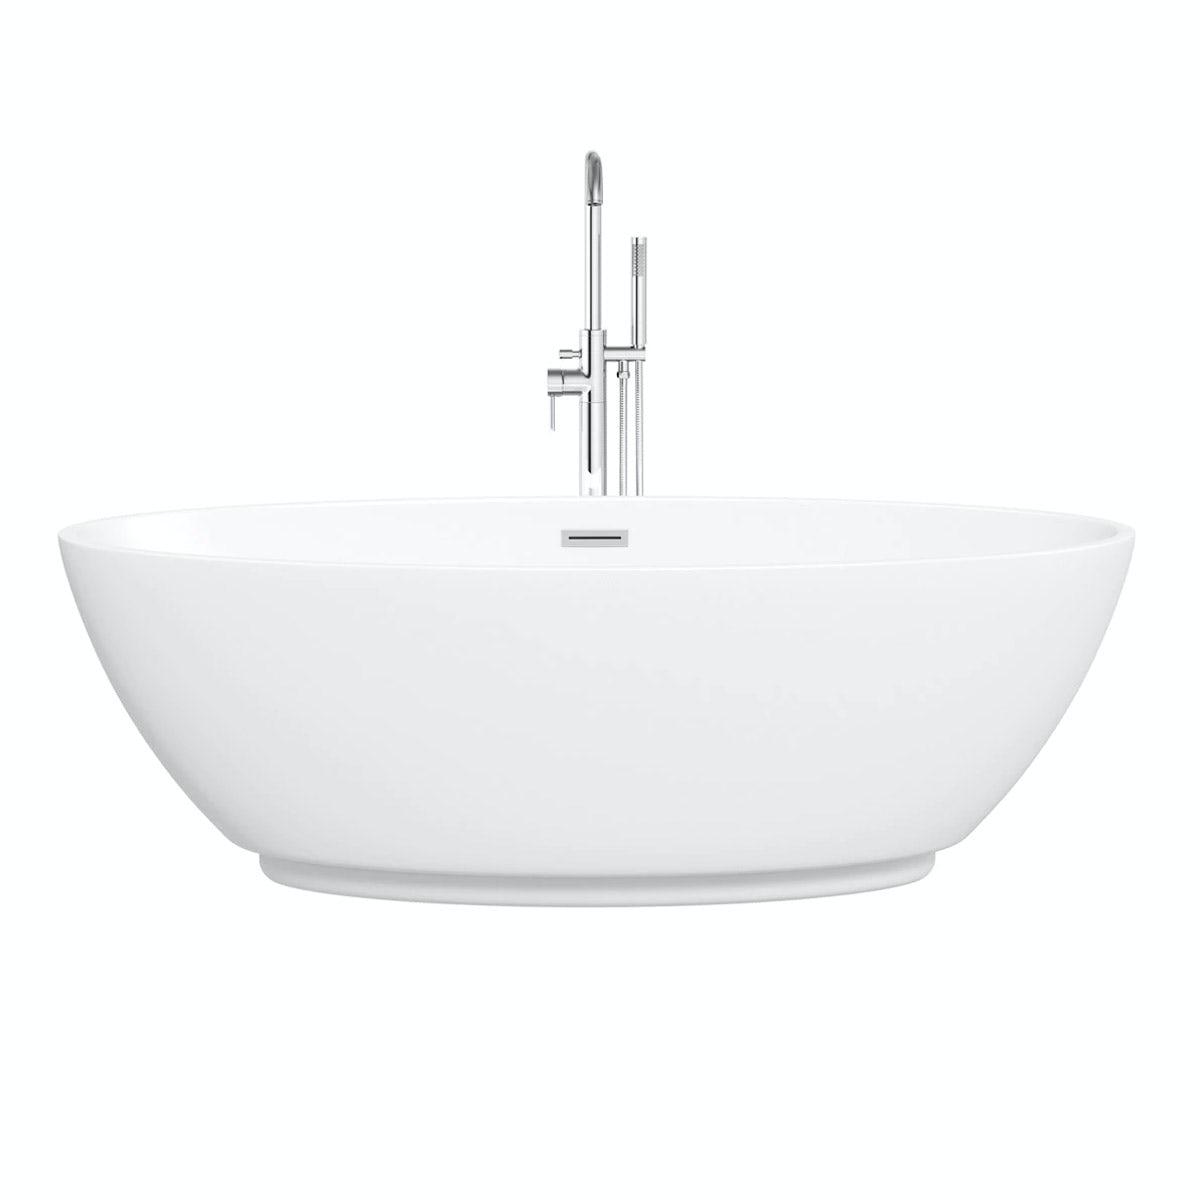 Comfortable Light Grey Tile Bathroom Floor Big Bathroom Rentals Cost Square Custom Bath Vanities Chicago Mosaic Bathrooms Design Young Wash Basin Designs For Small Bathrooms In India BlueBathroom Vainities Small \u0026amp; Large Baths From £99.99 | VictoriaPlum